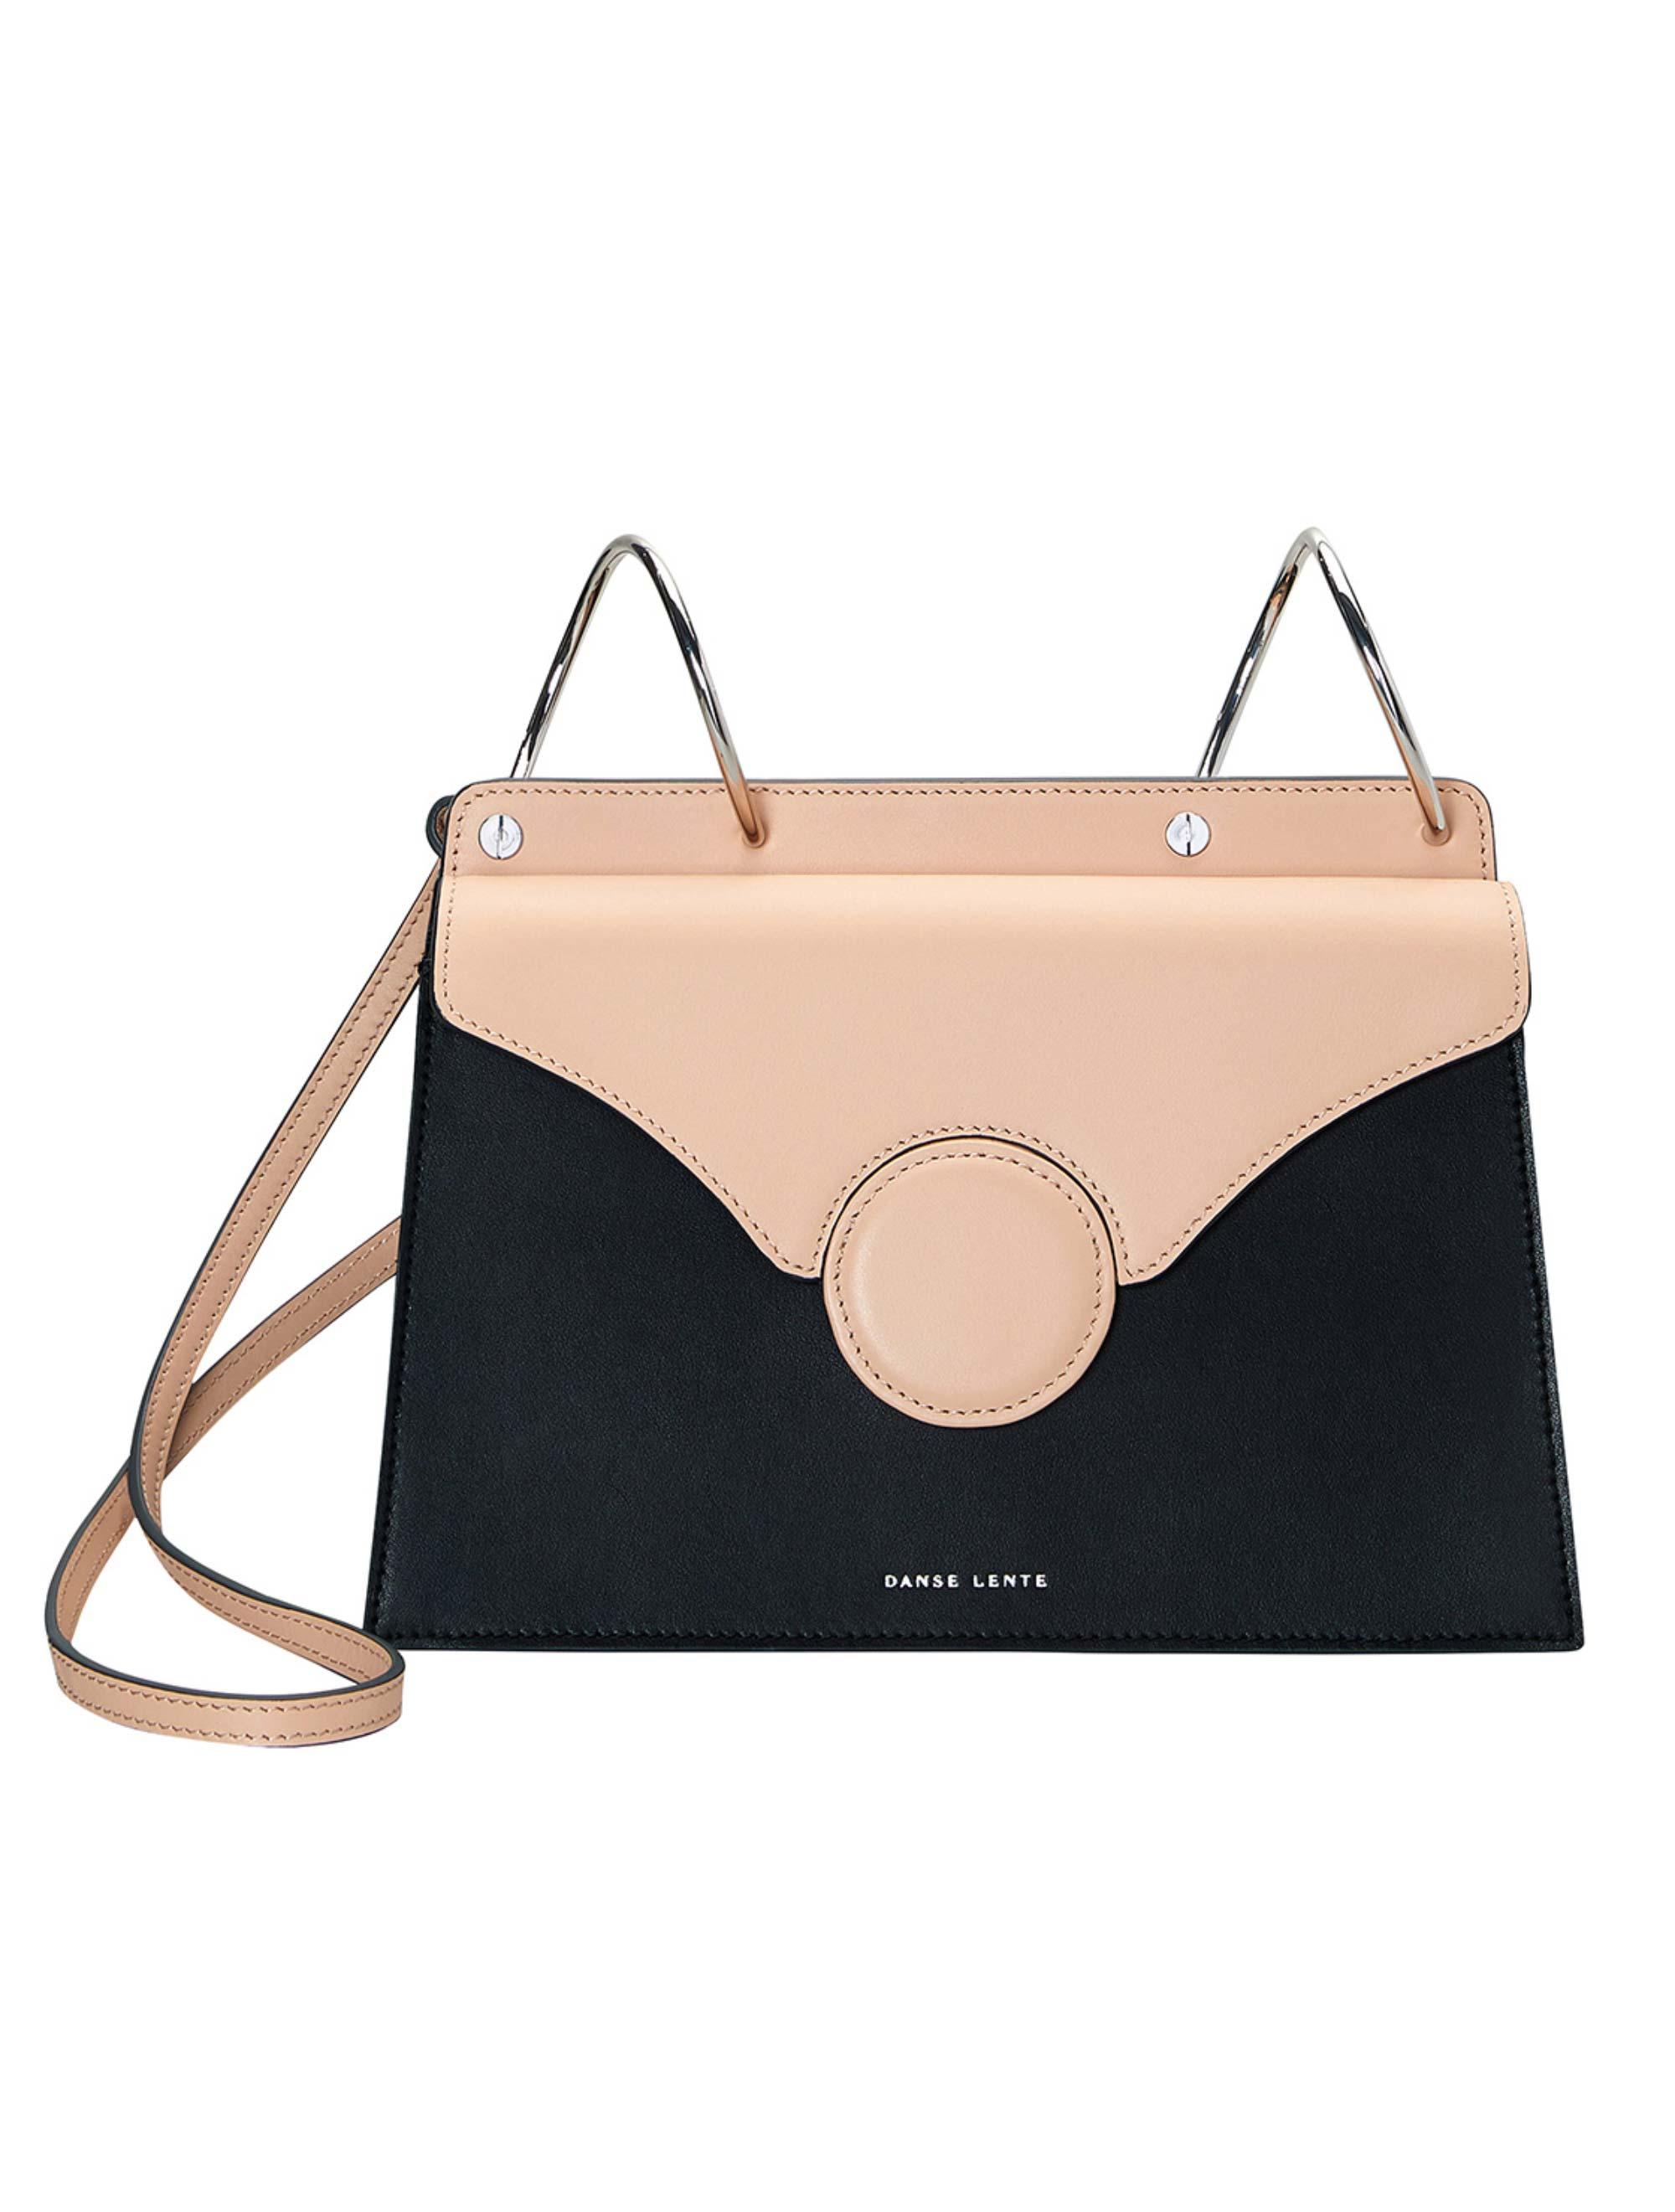 Mimma – Lente Shopping Danse Ninni Fashion And Phoebe Ds0006 Luxury 550rwTq